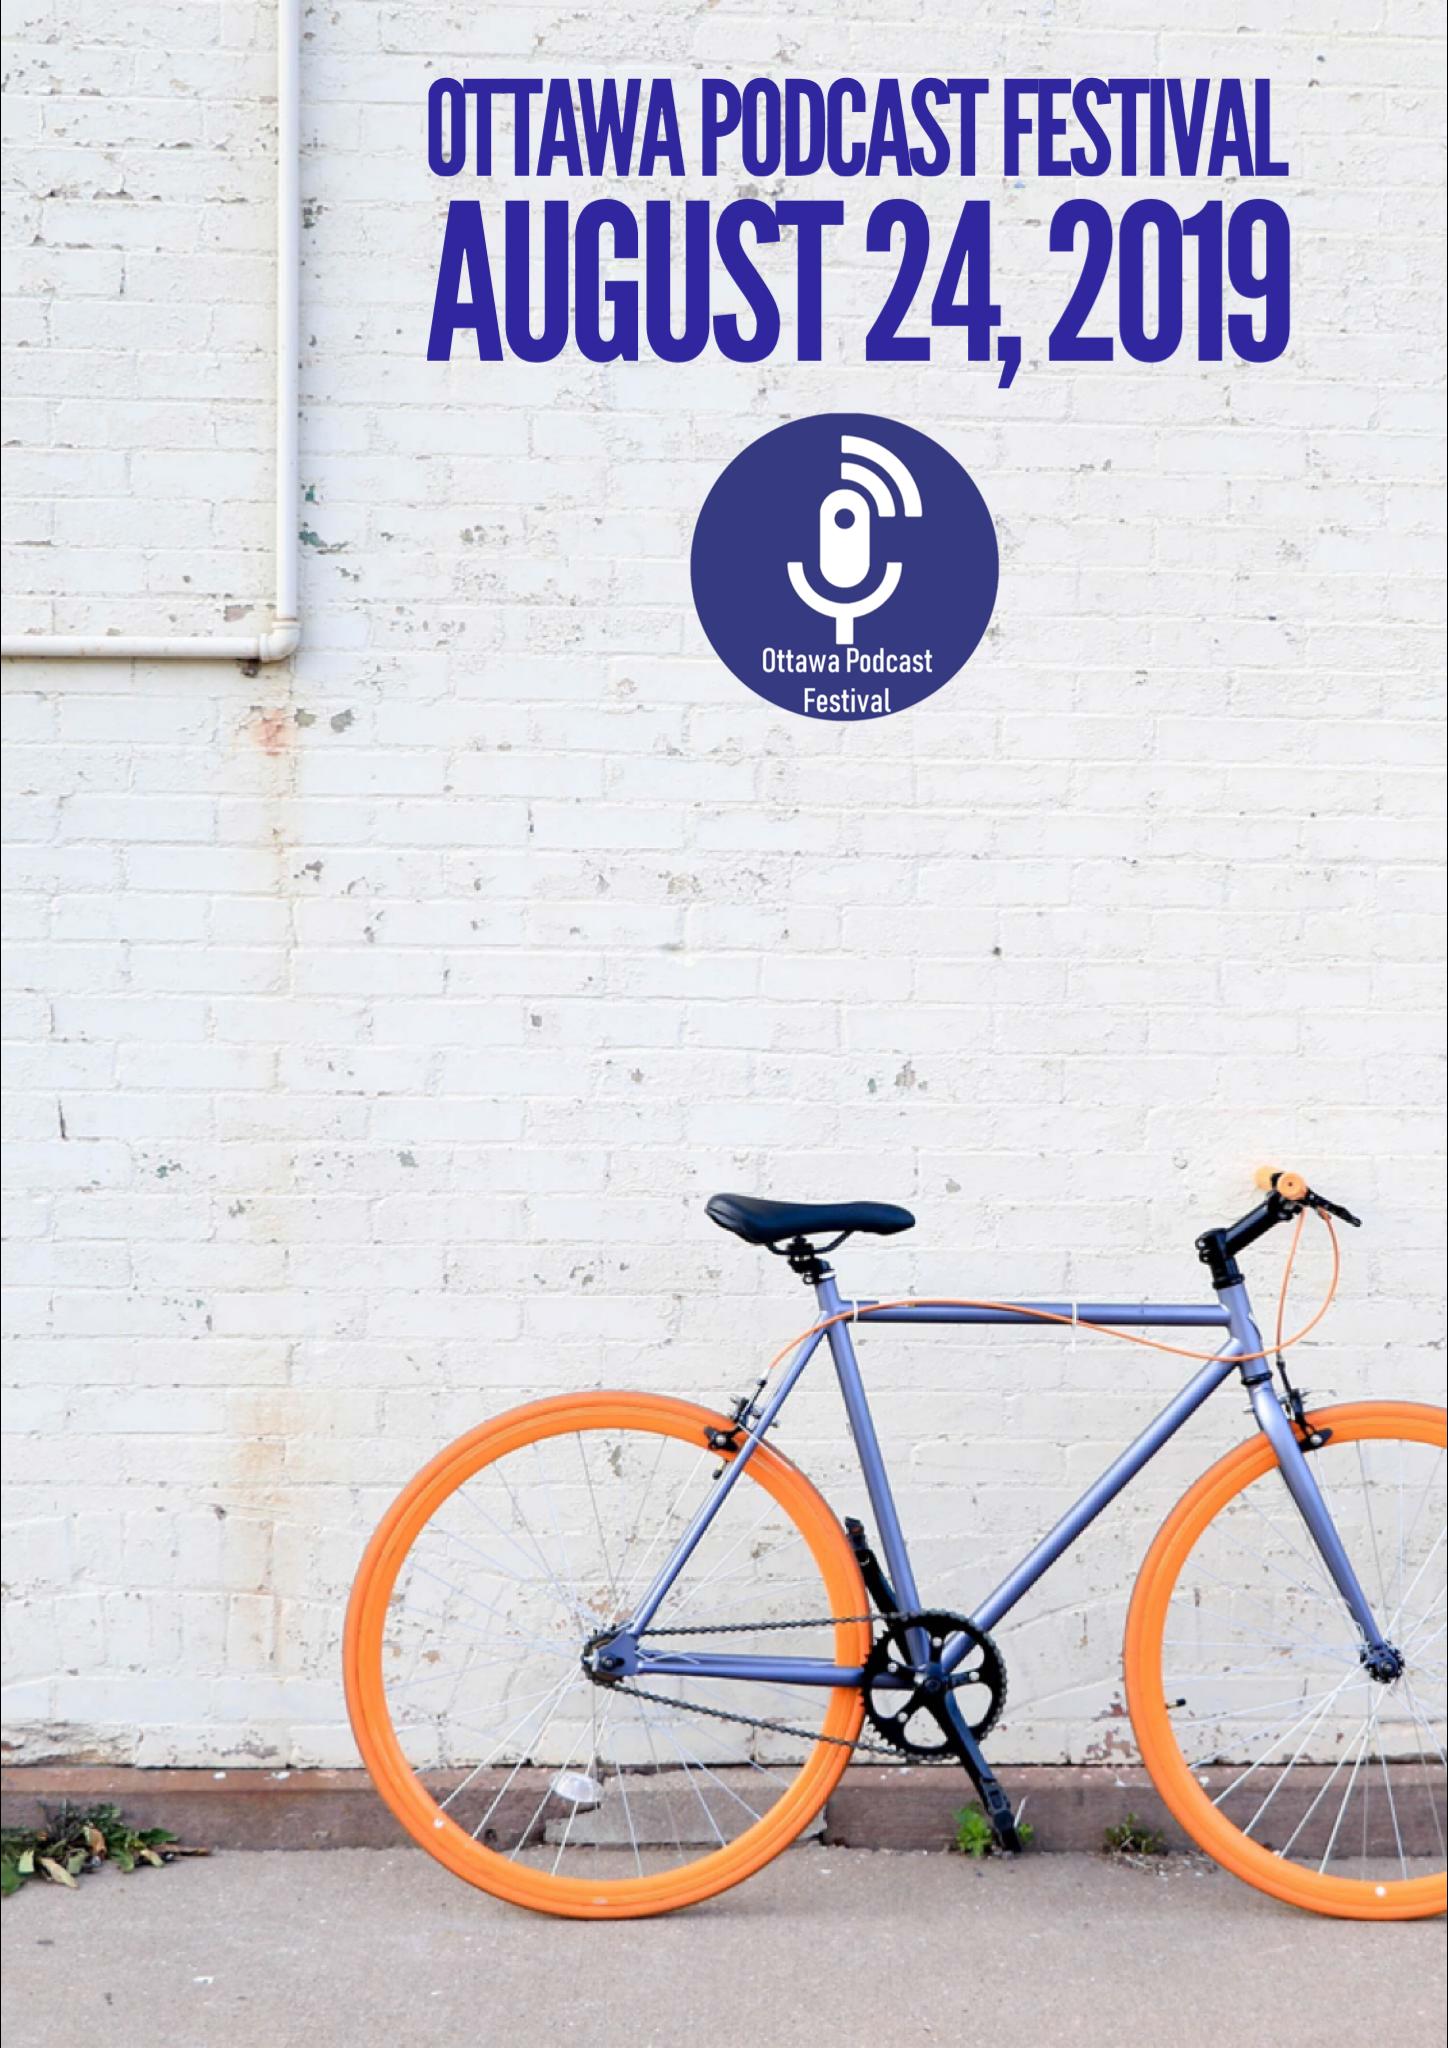 Ottawa Podcast Festival - On the Move